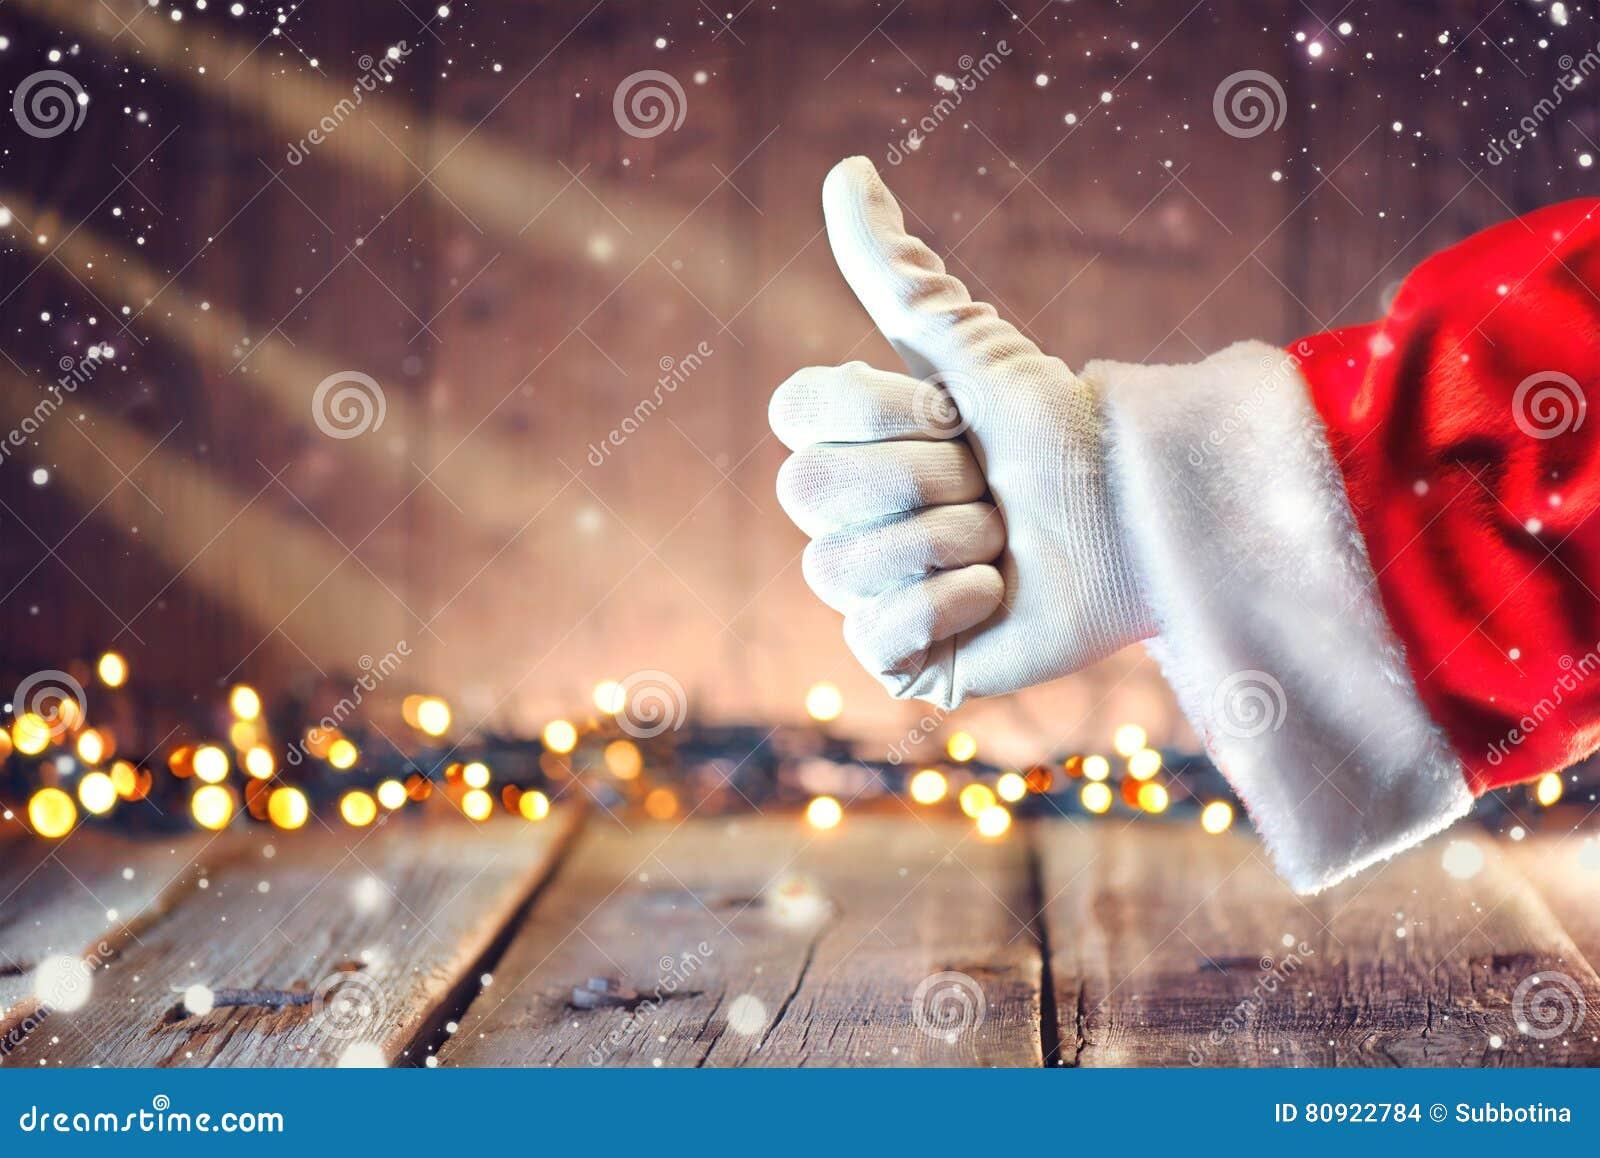 Polegar de Santa Claus acima do gesto sobre o fundo do Natal